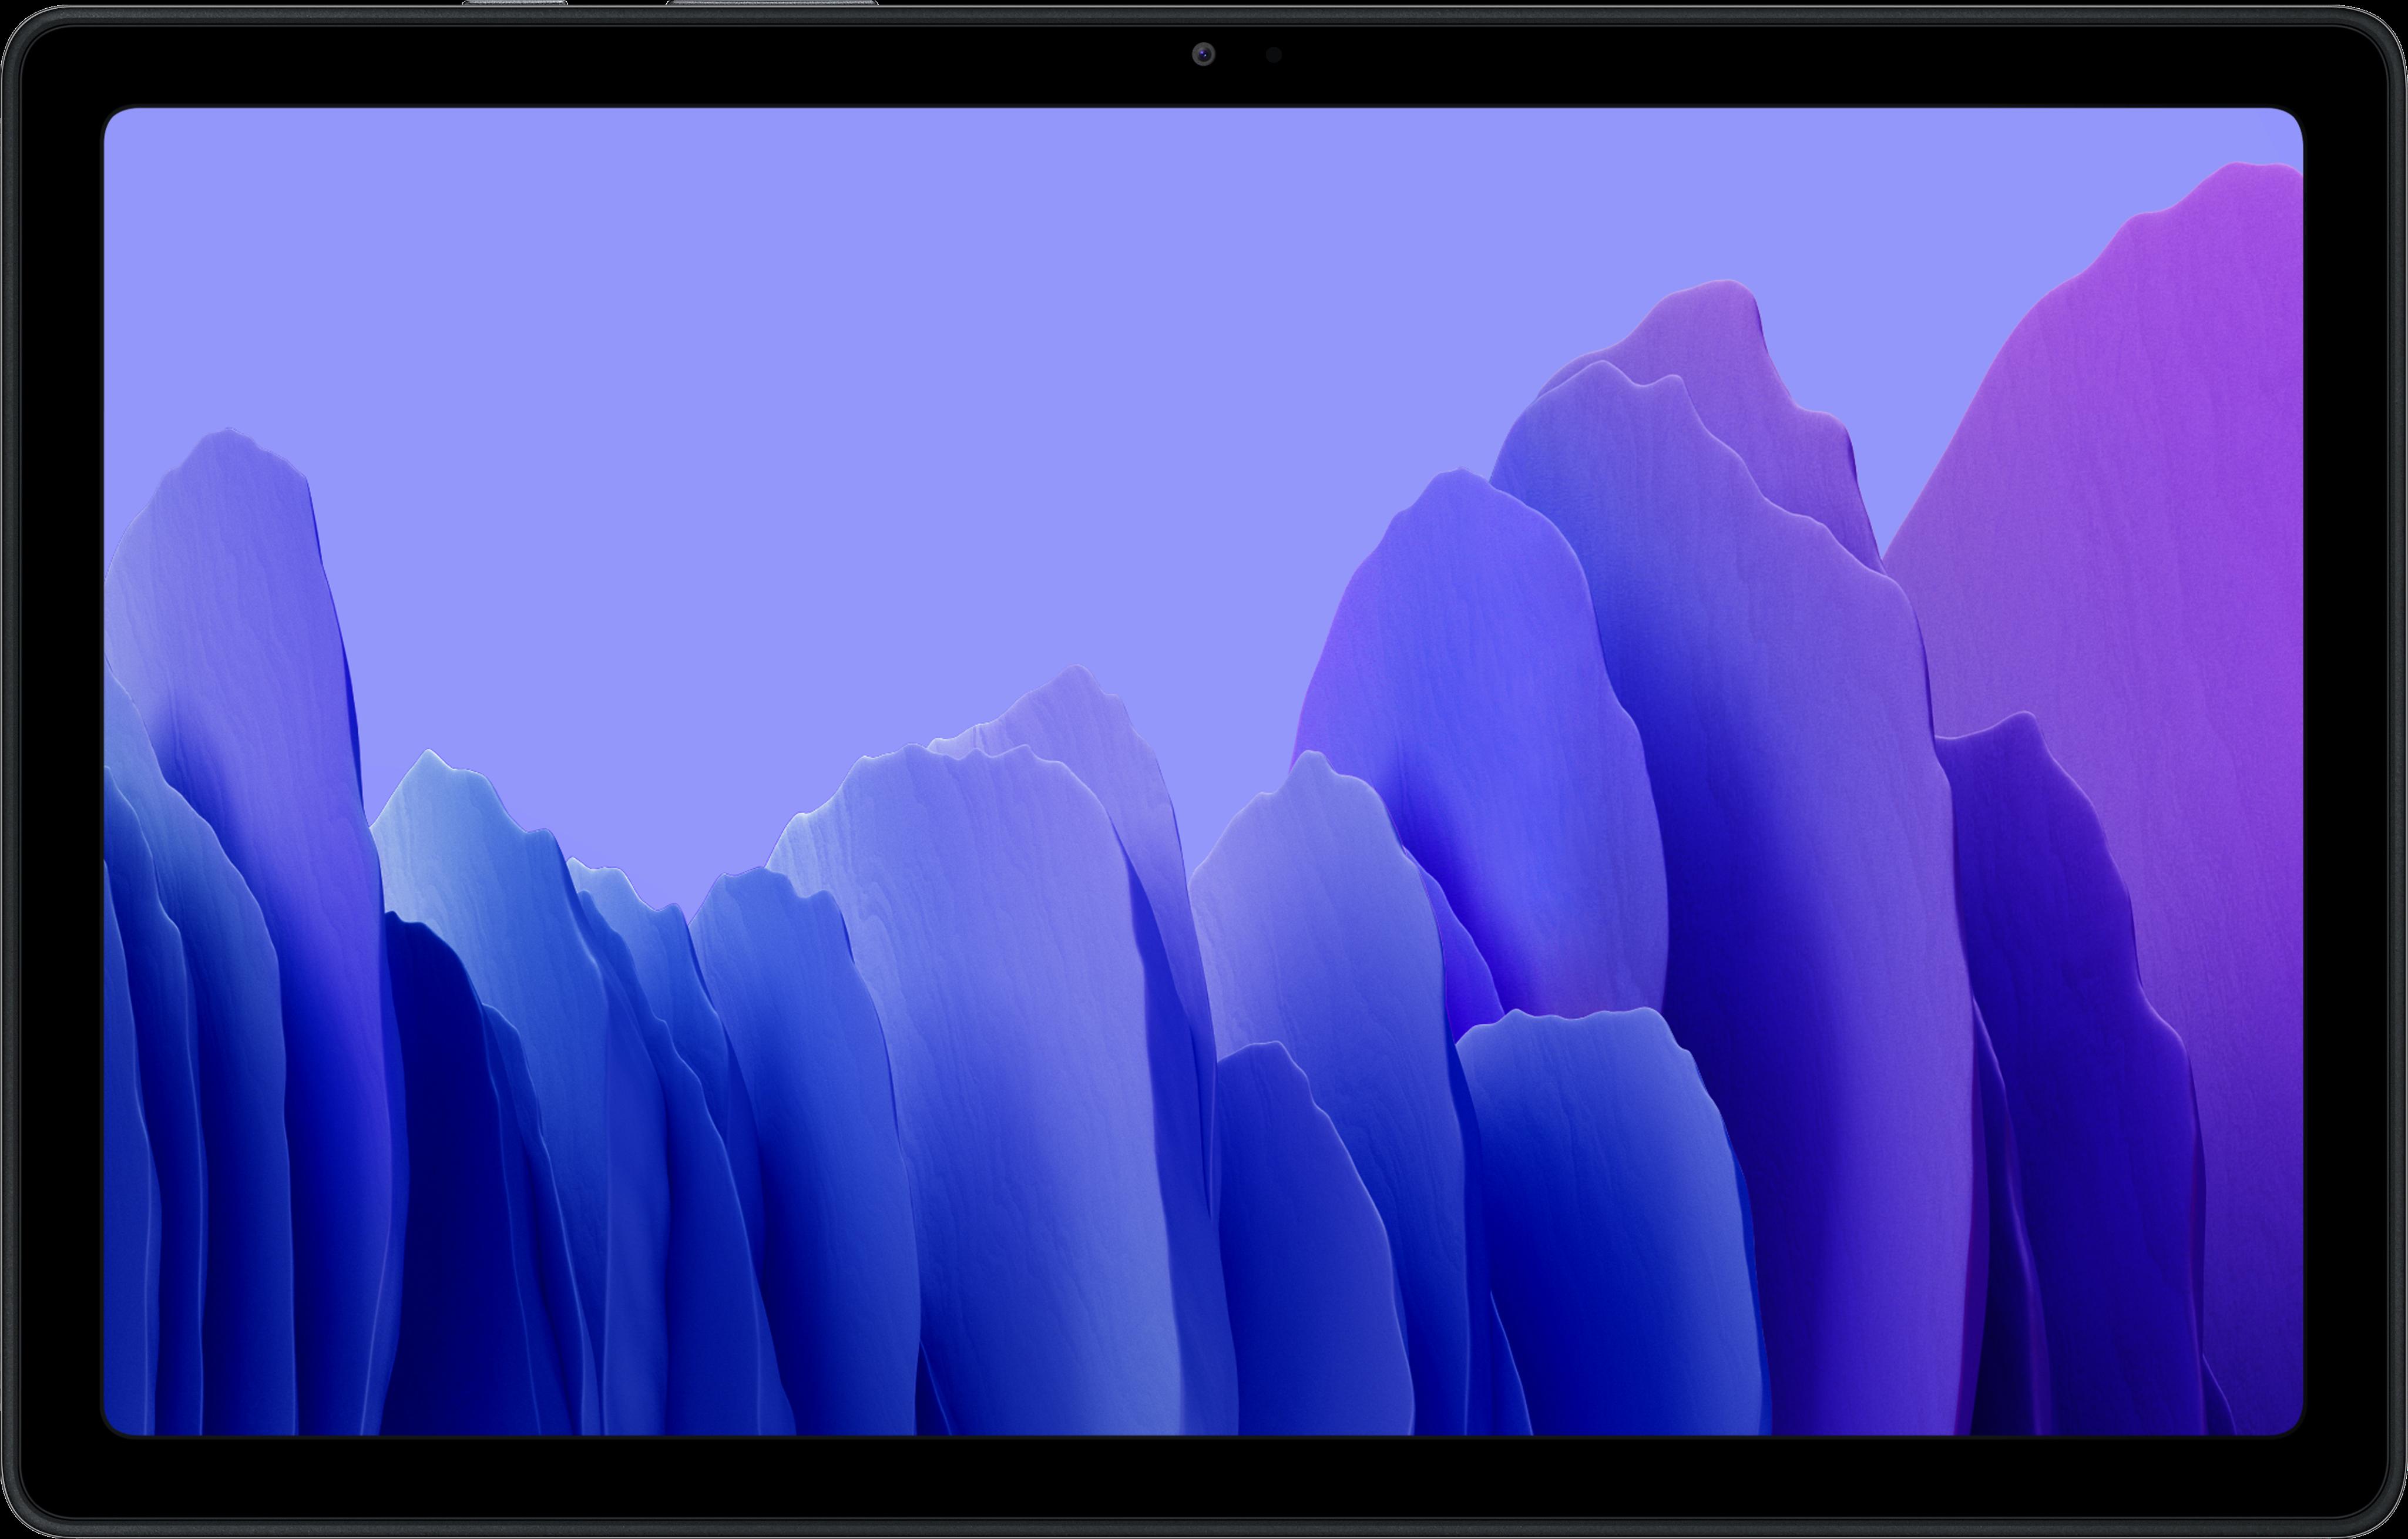 Samsung Tablet Galaxy Tab A7 (2020) - WiFi - Android™ 10 - 32GB